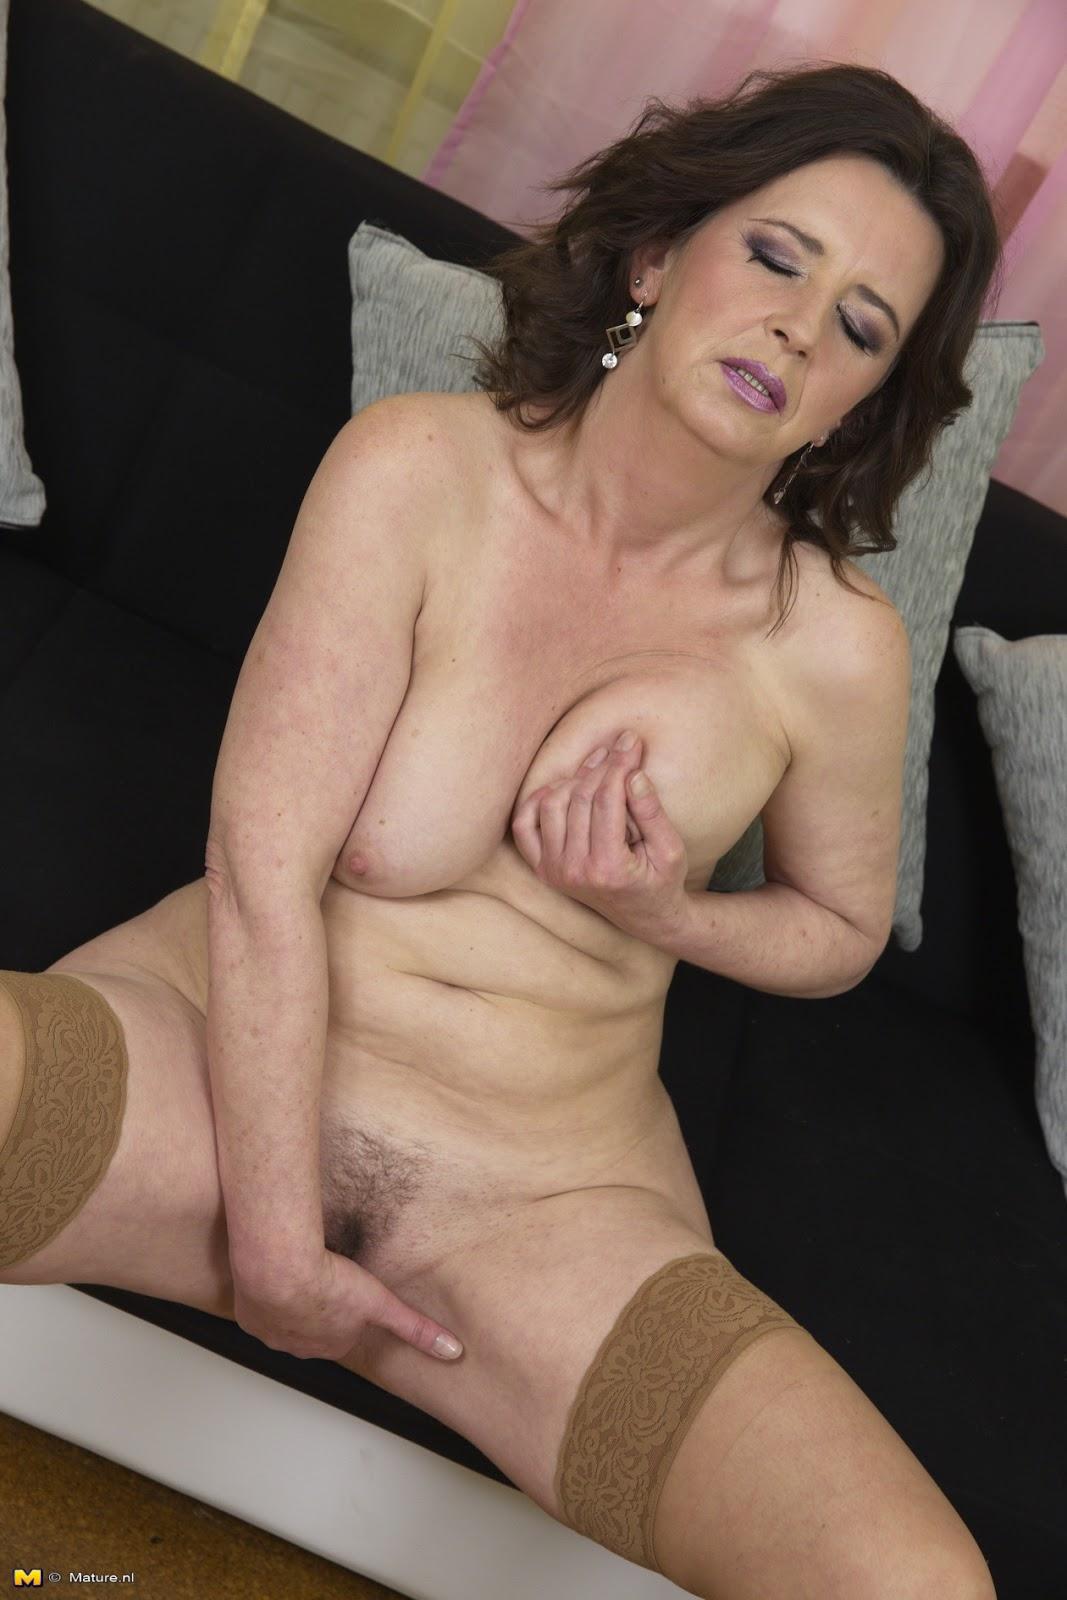 nude tight ass girl spread tumblr